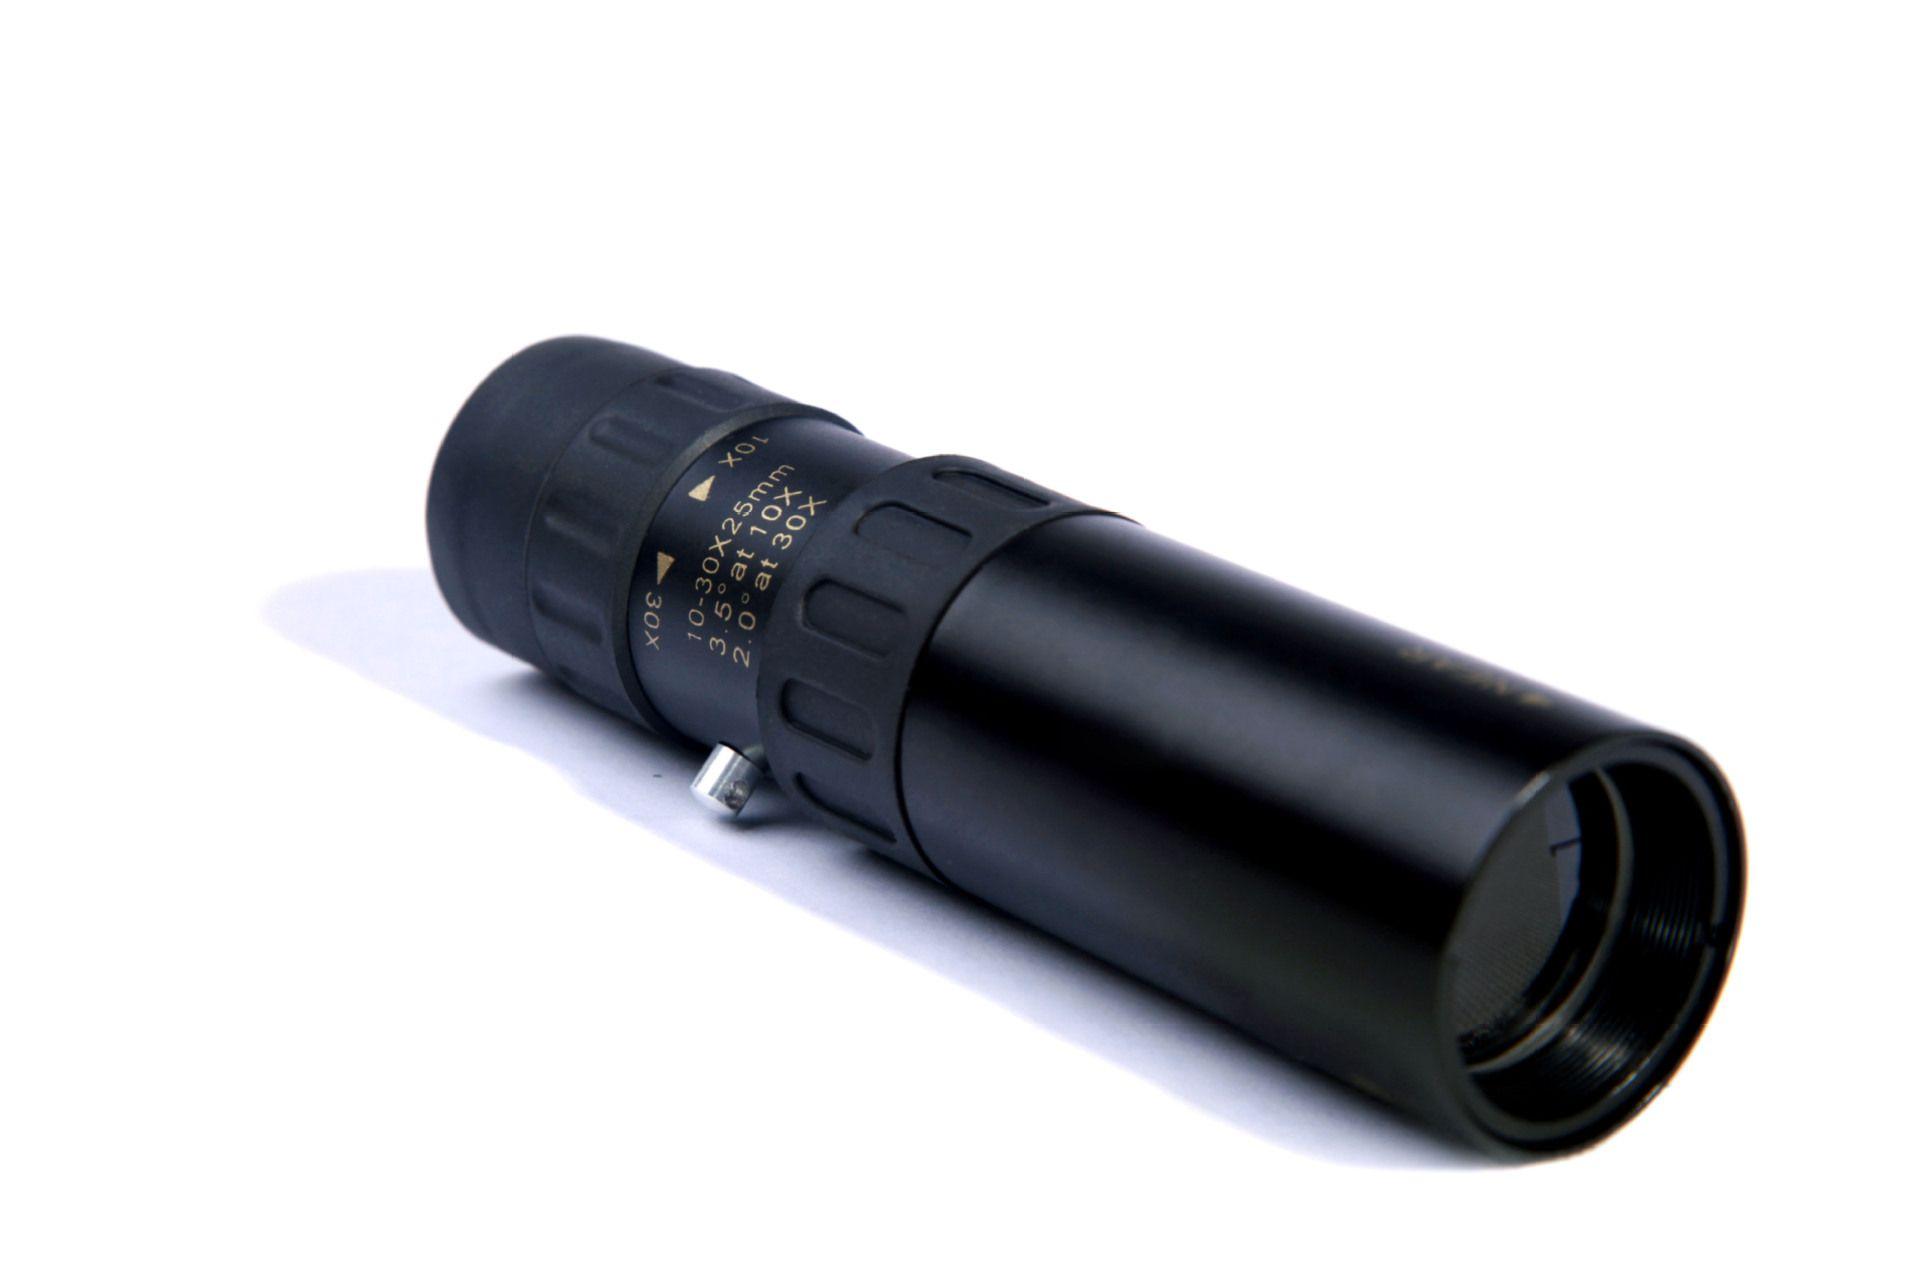 Original binoculars 10-30x25 Zoom Monocular high quality Telescope Cameras Pocket Binoculo Hunting Optical Prism Scope no tripod